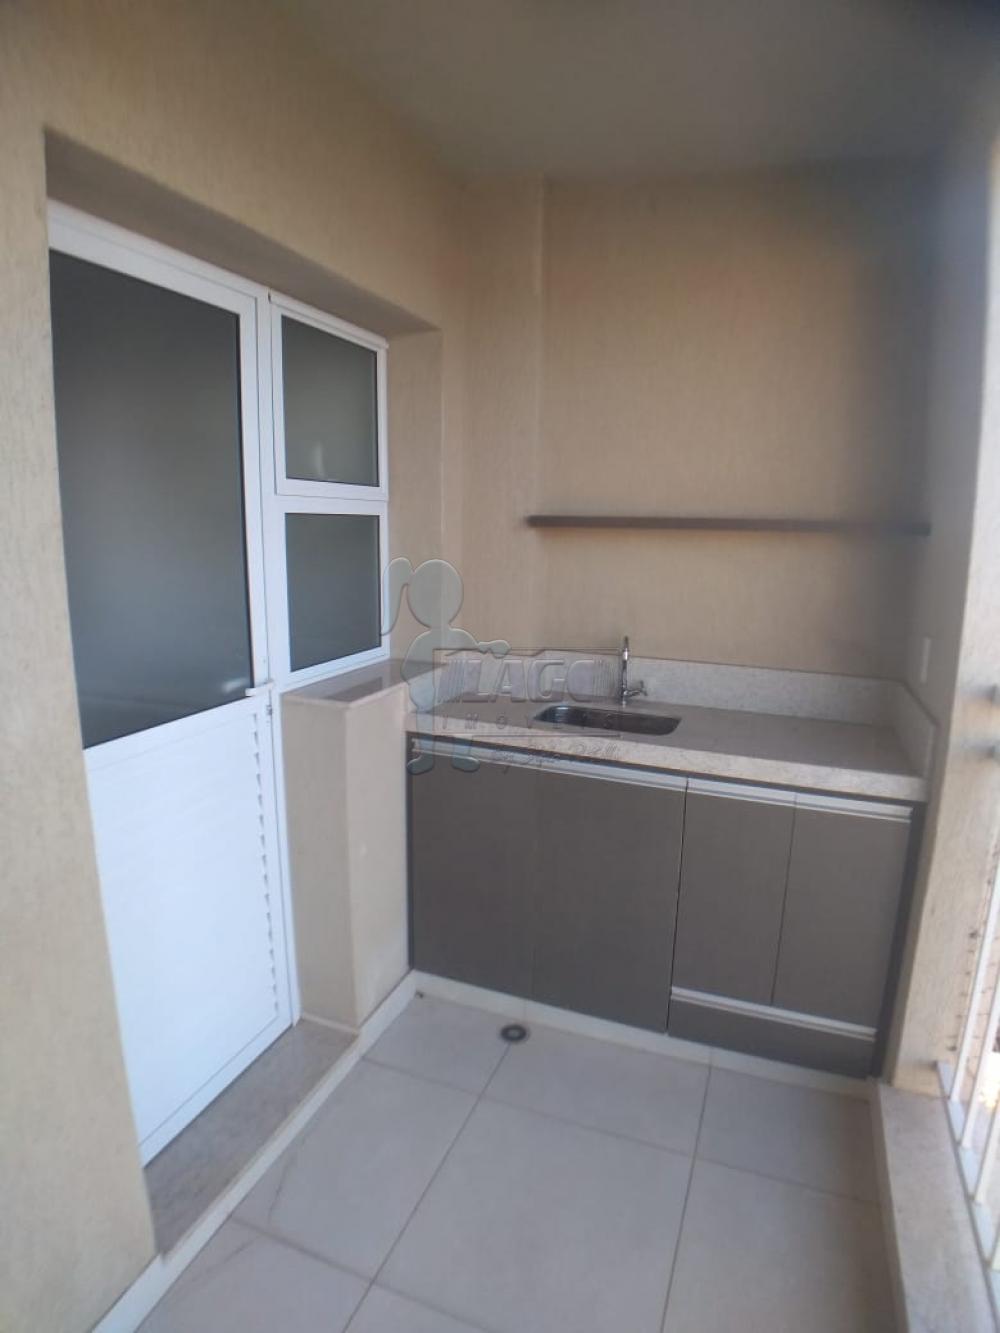 Ribeirao Preto Apartamento Locacao R$ 1.400,00 Condominio R$488,00 3 Dormitorios 1 Suite Area do terreno 27.42m2 Area construida 95.51m2